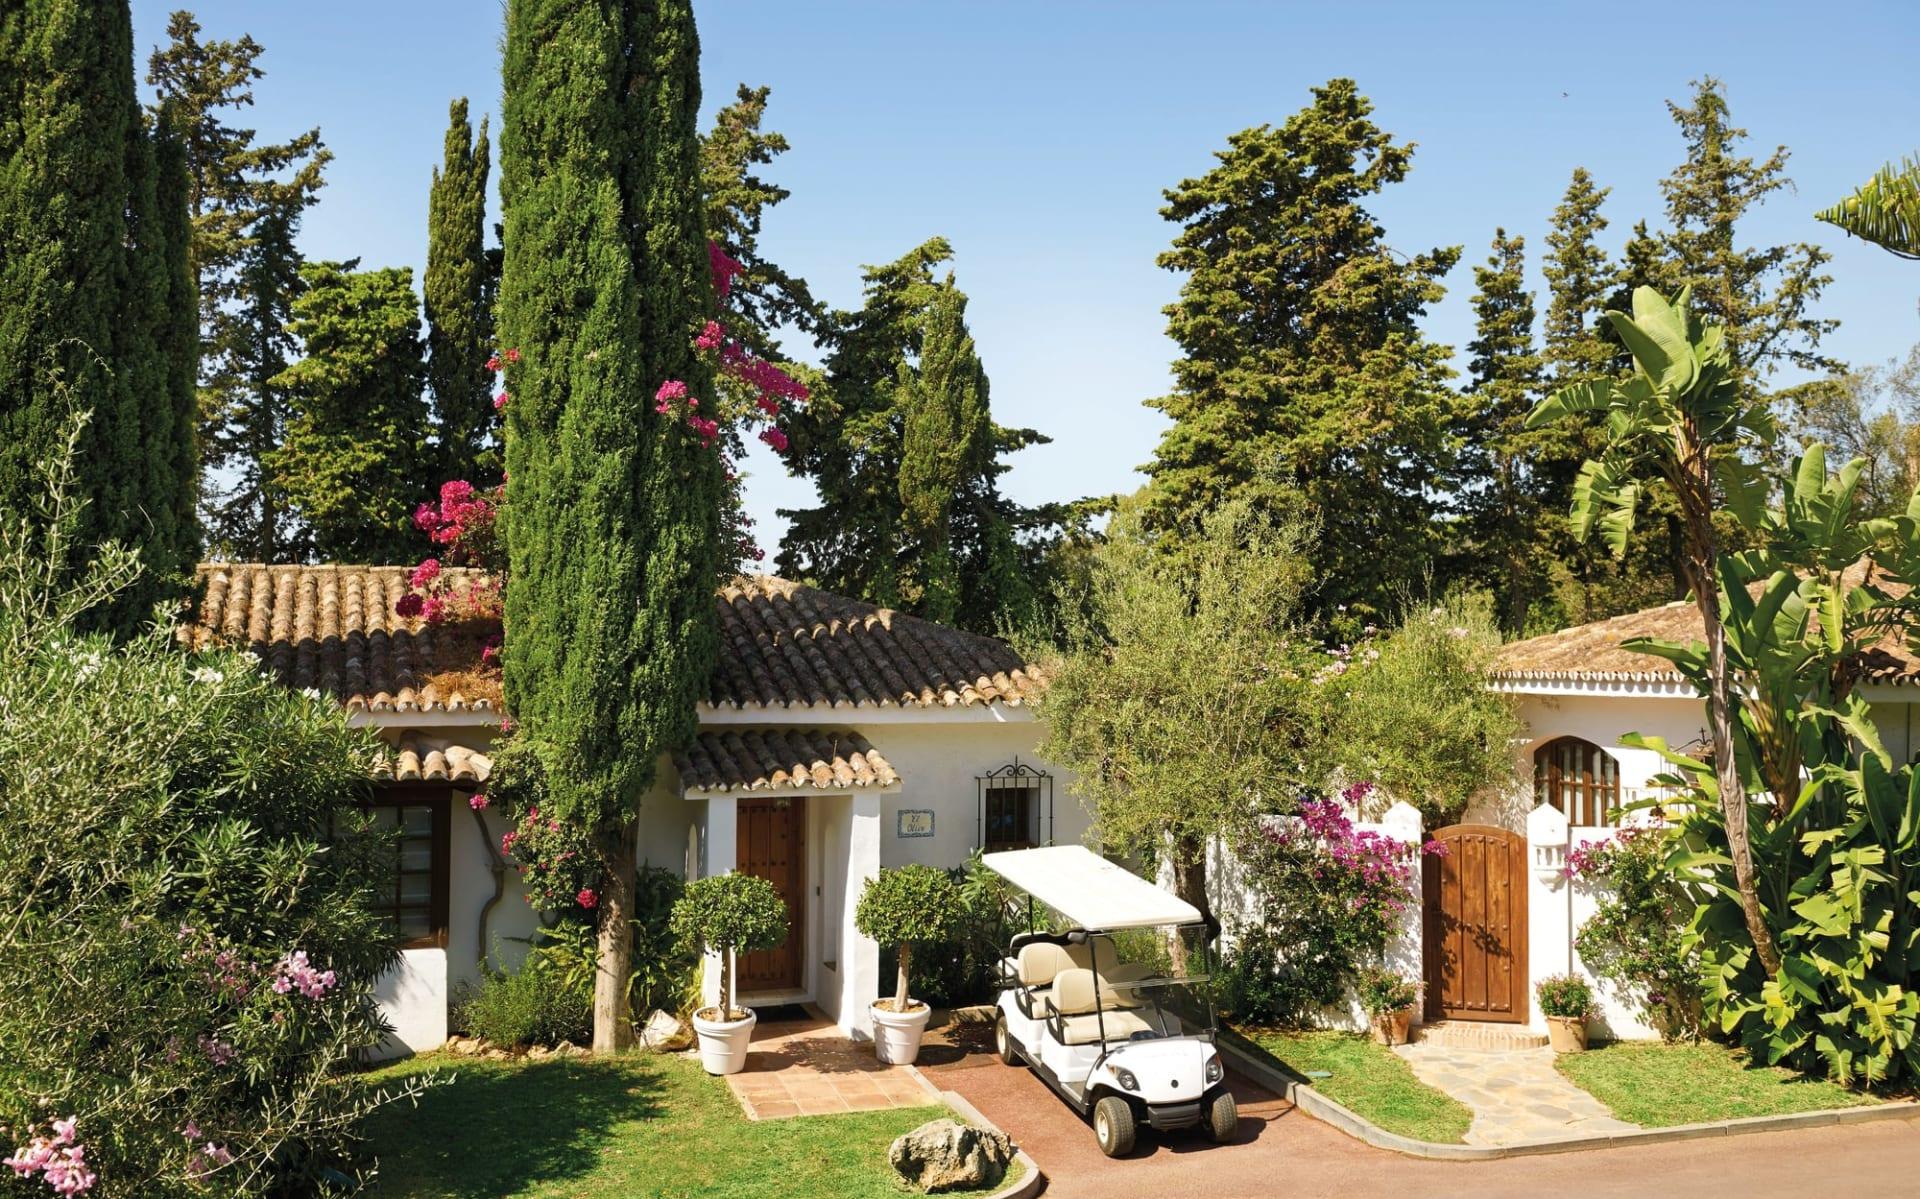 Marbella Club Golf Resort & Spa:  Marbella Club Golf Resort & Spa - Villa